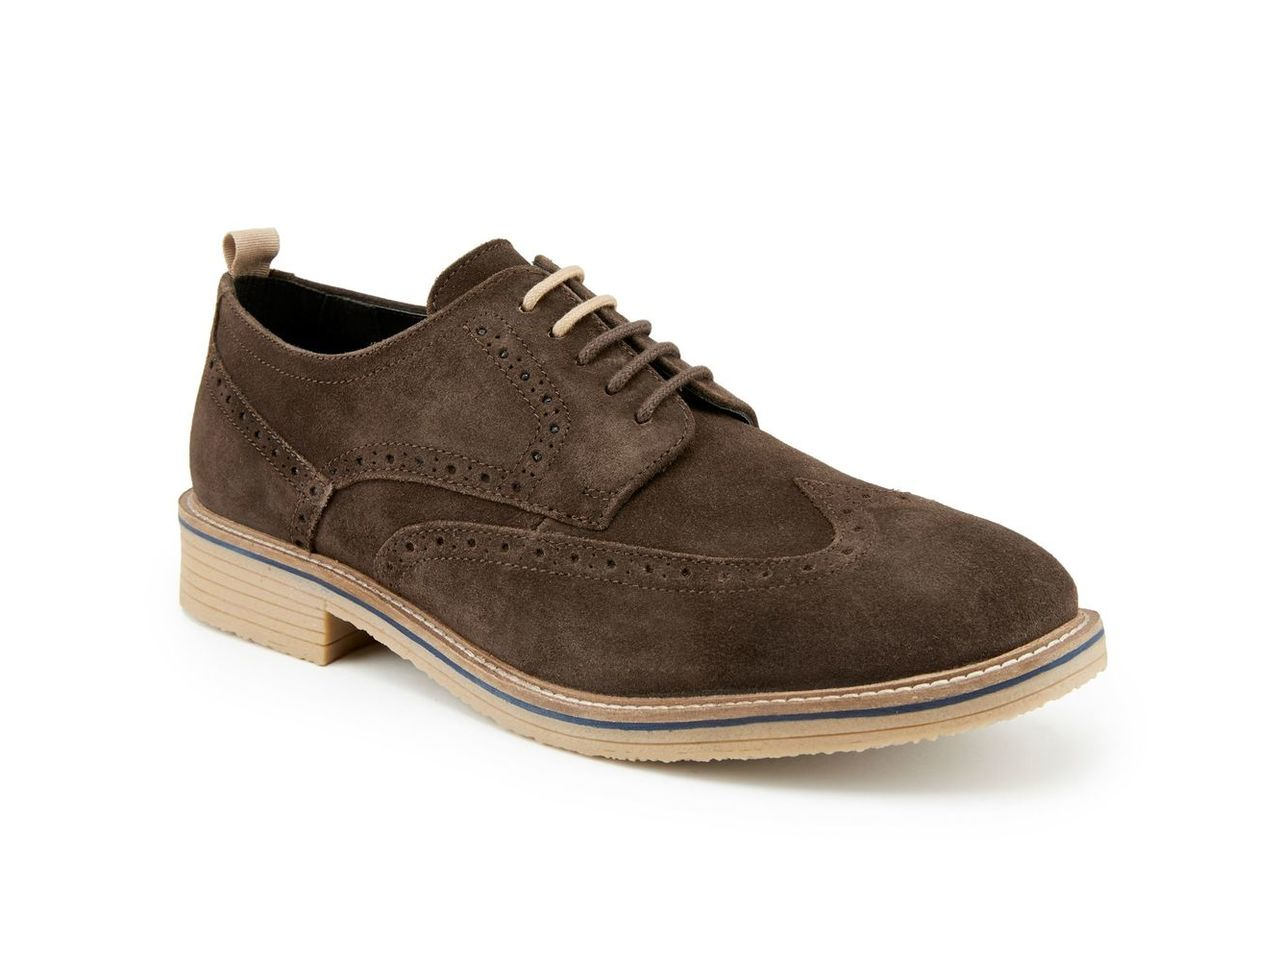 Skopes Suede Brogue Shoes, Brown